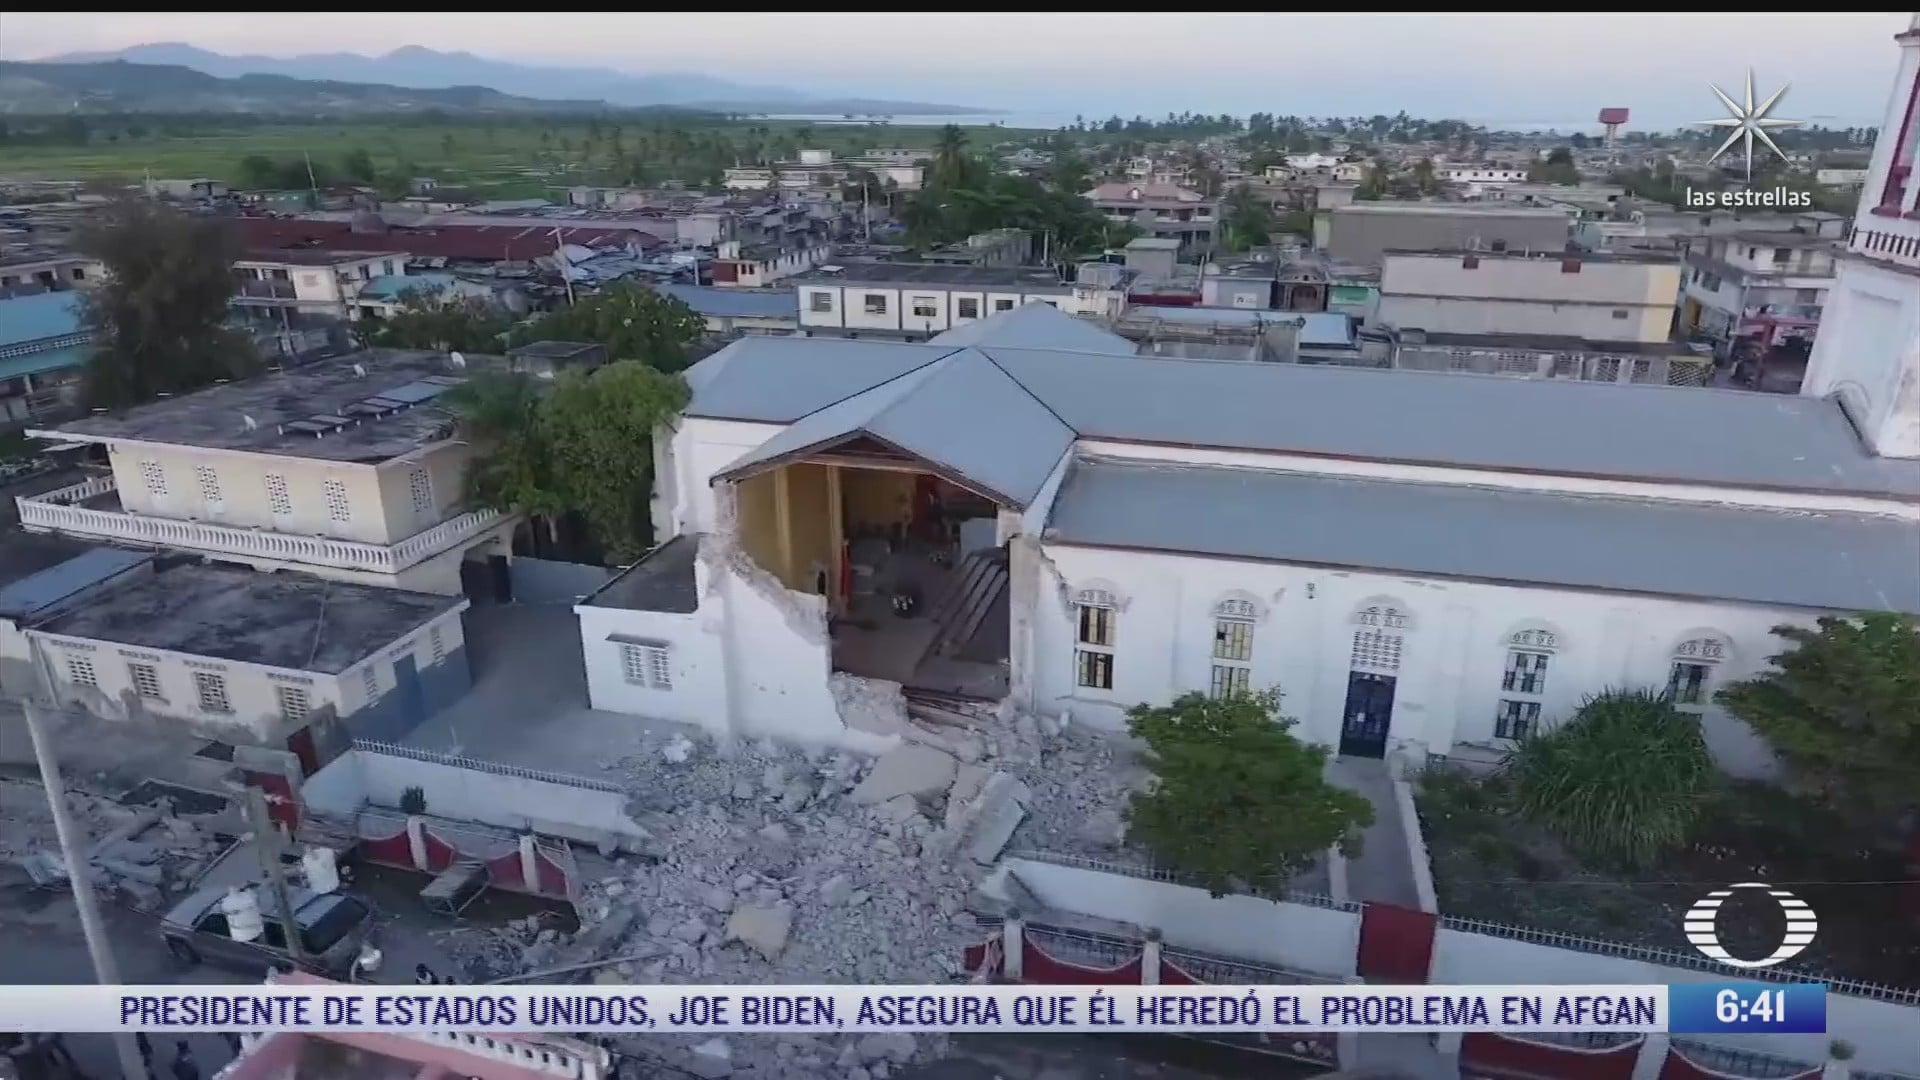 devastacion en haiti por terremoto de magnitud